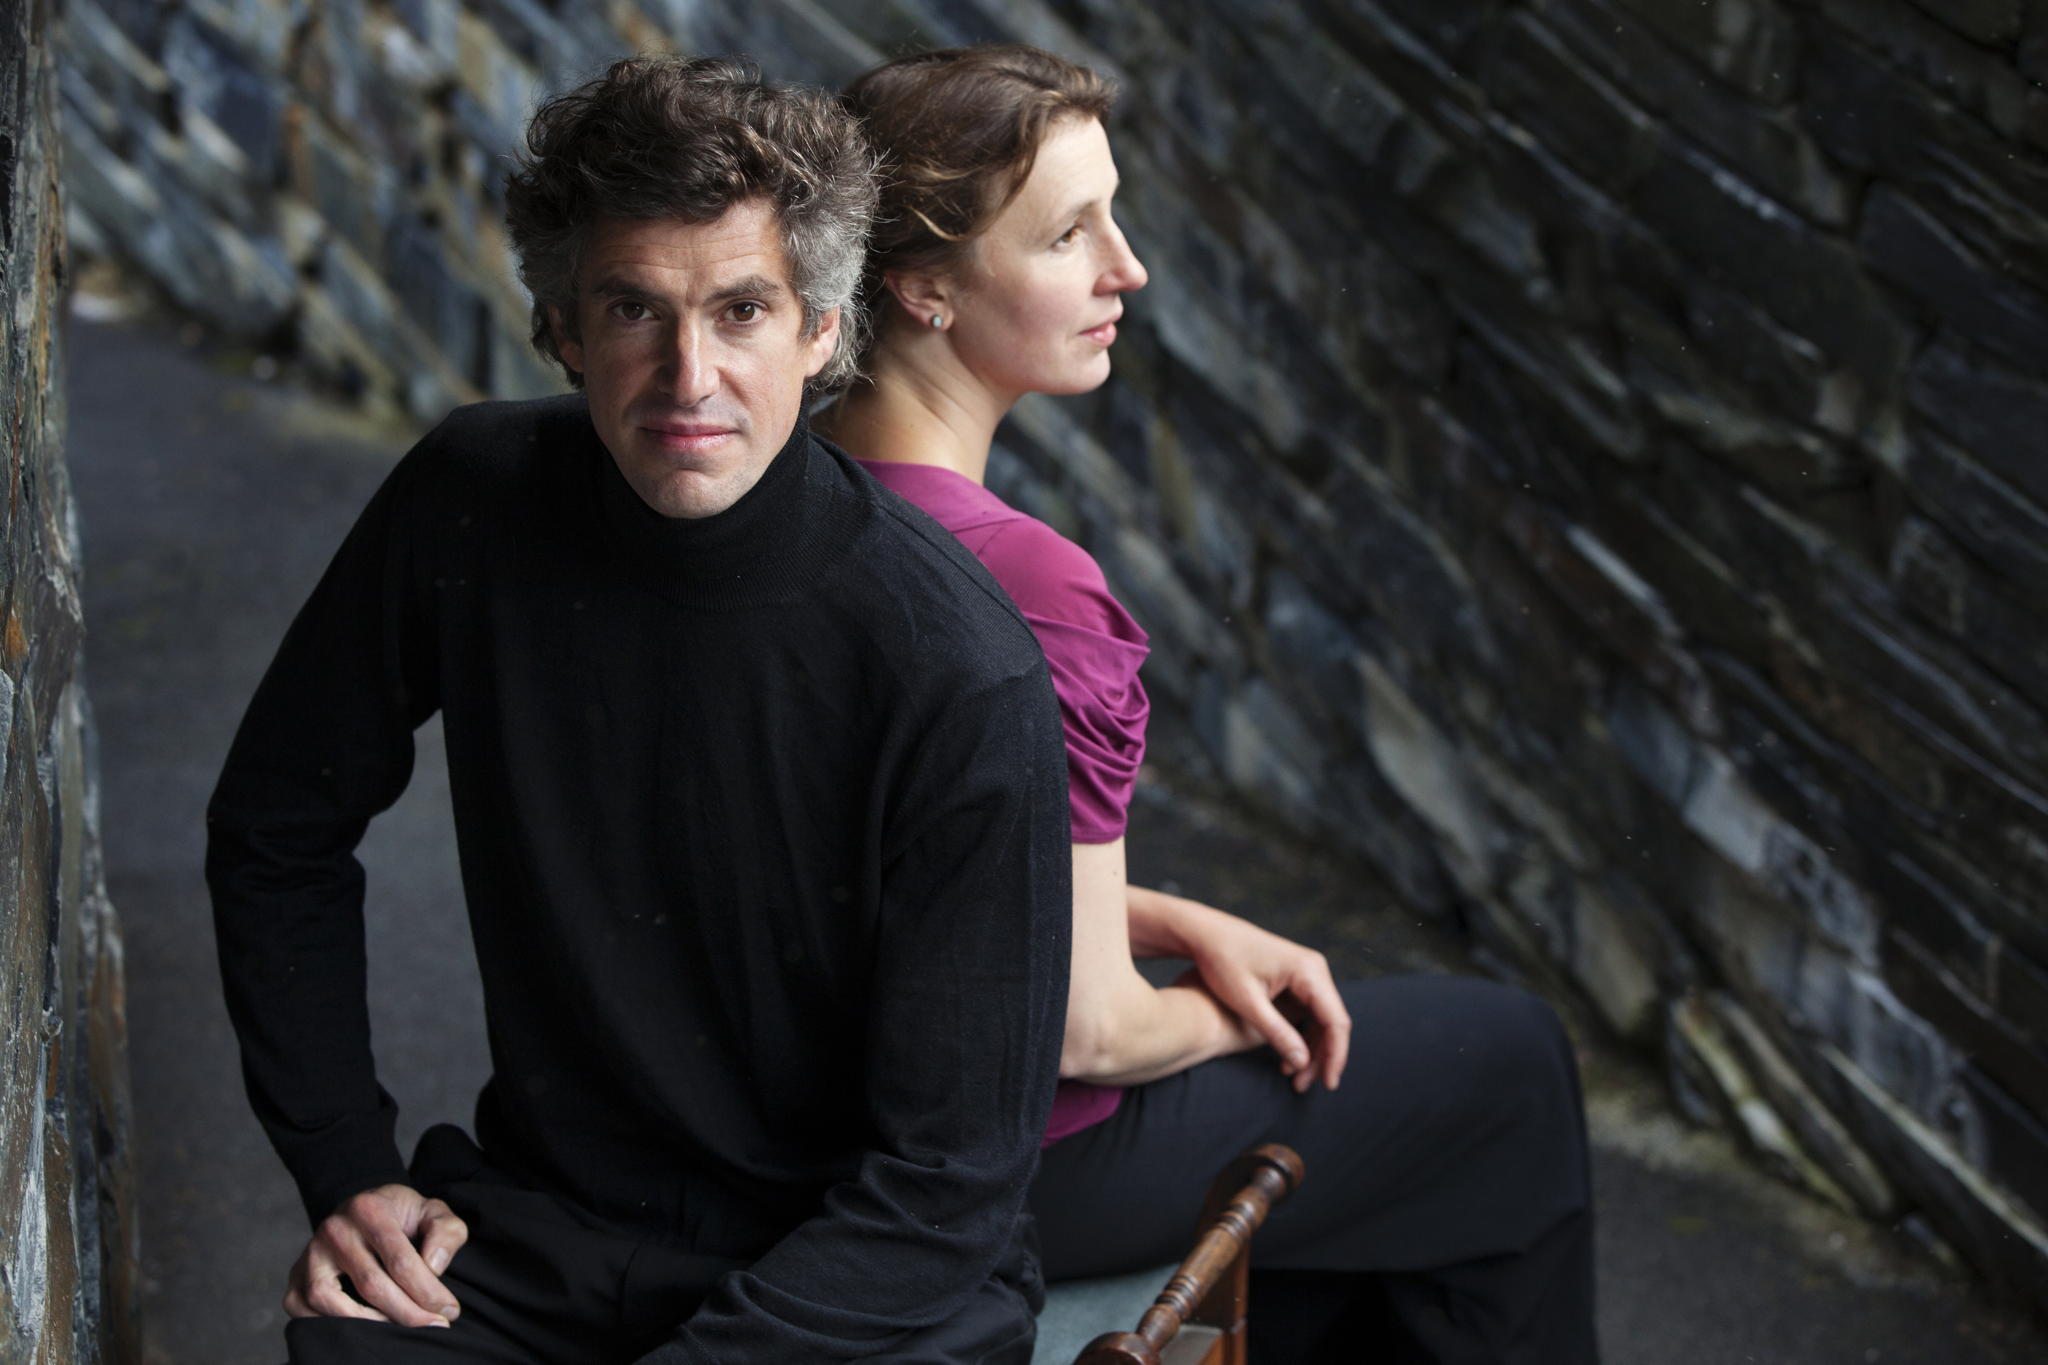 Richard Ormrod & mary Hofman